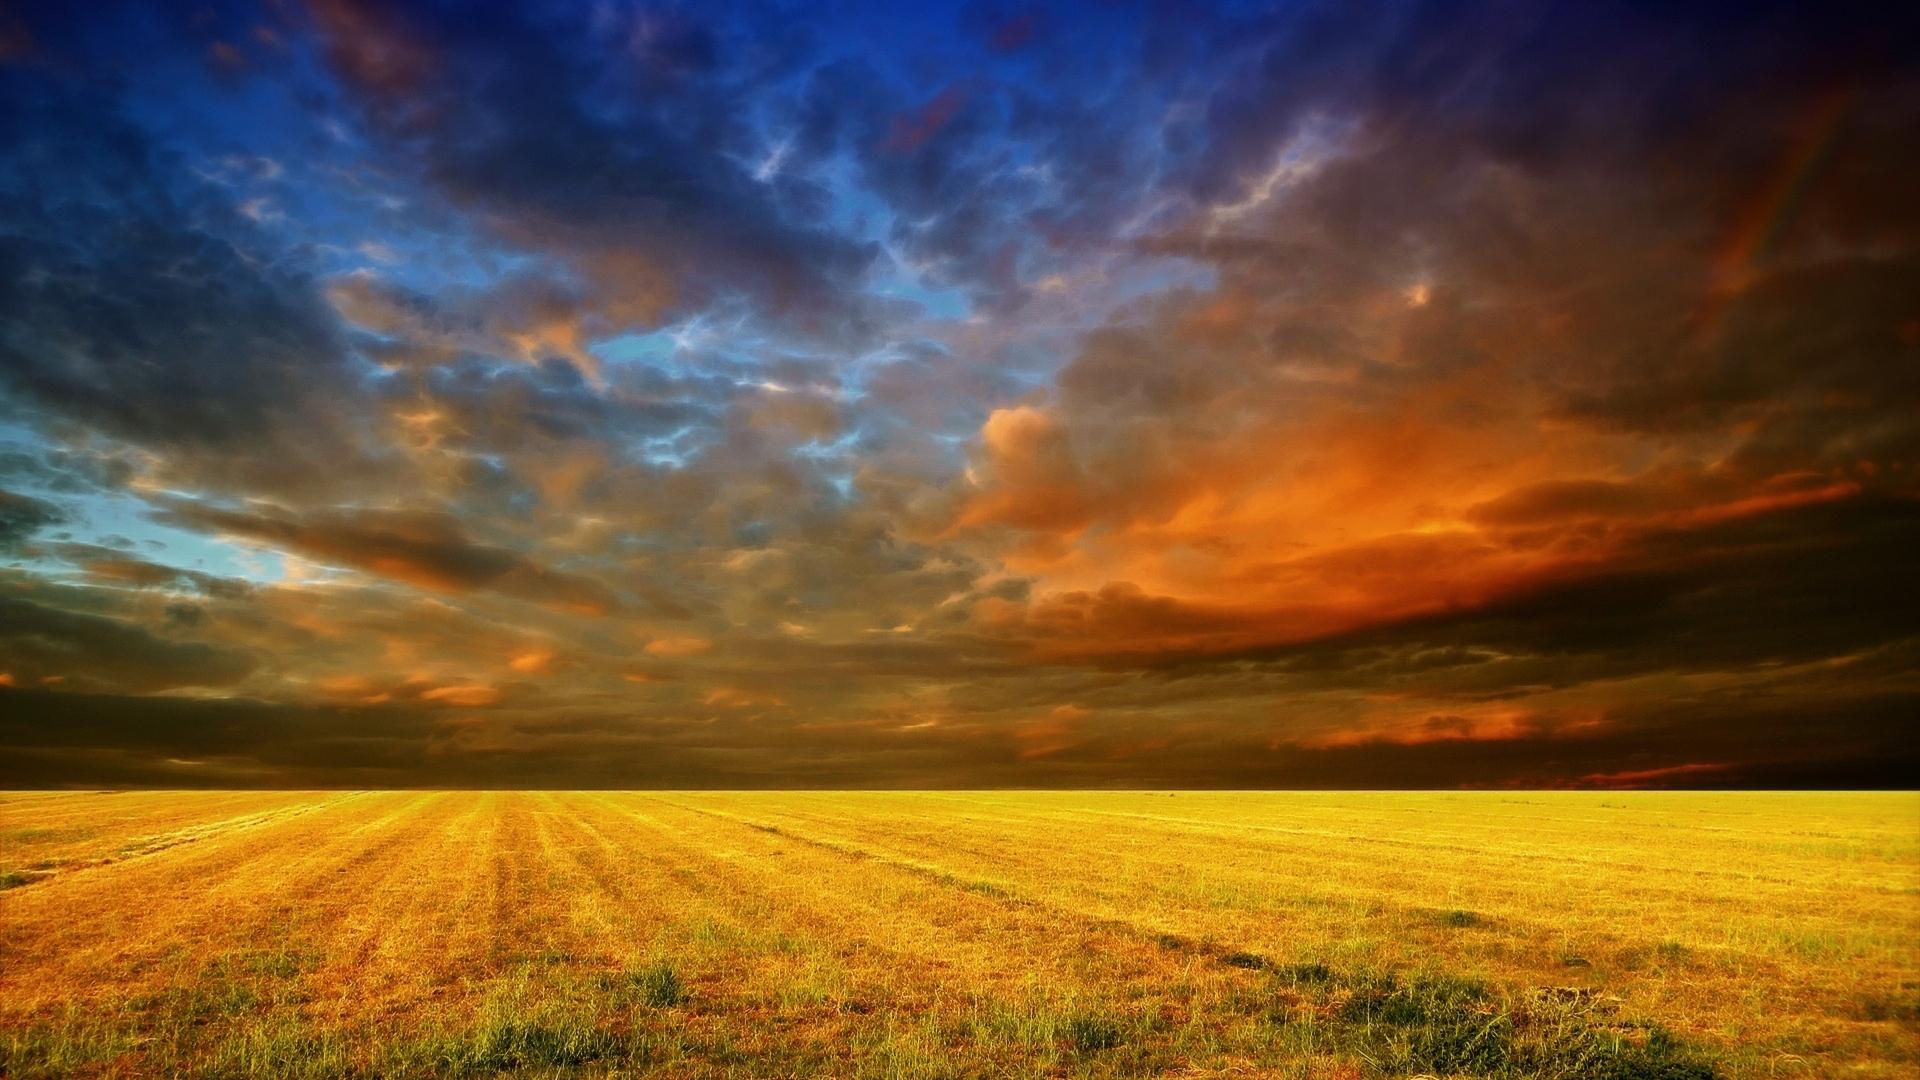 Awesome Weather Wallpaper Pixshark Com Images HD Wallpapers Download Free Images Wallpaper [1000image.com]